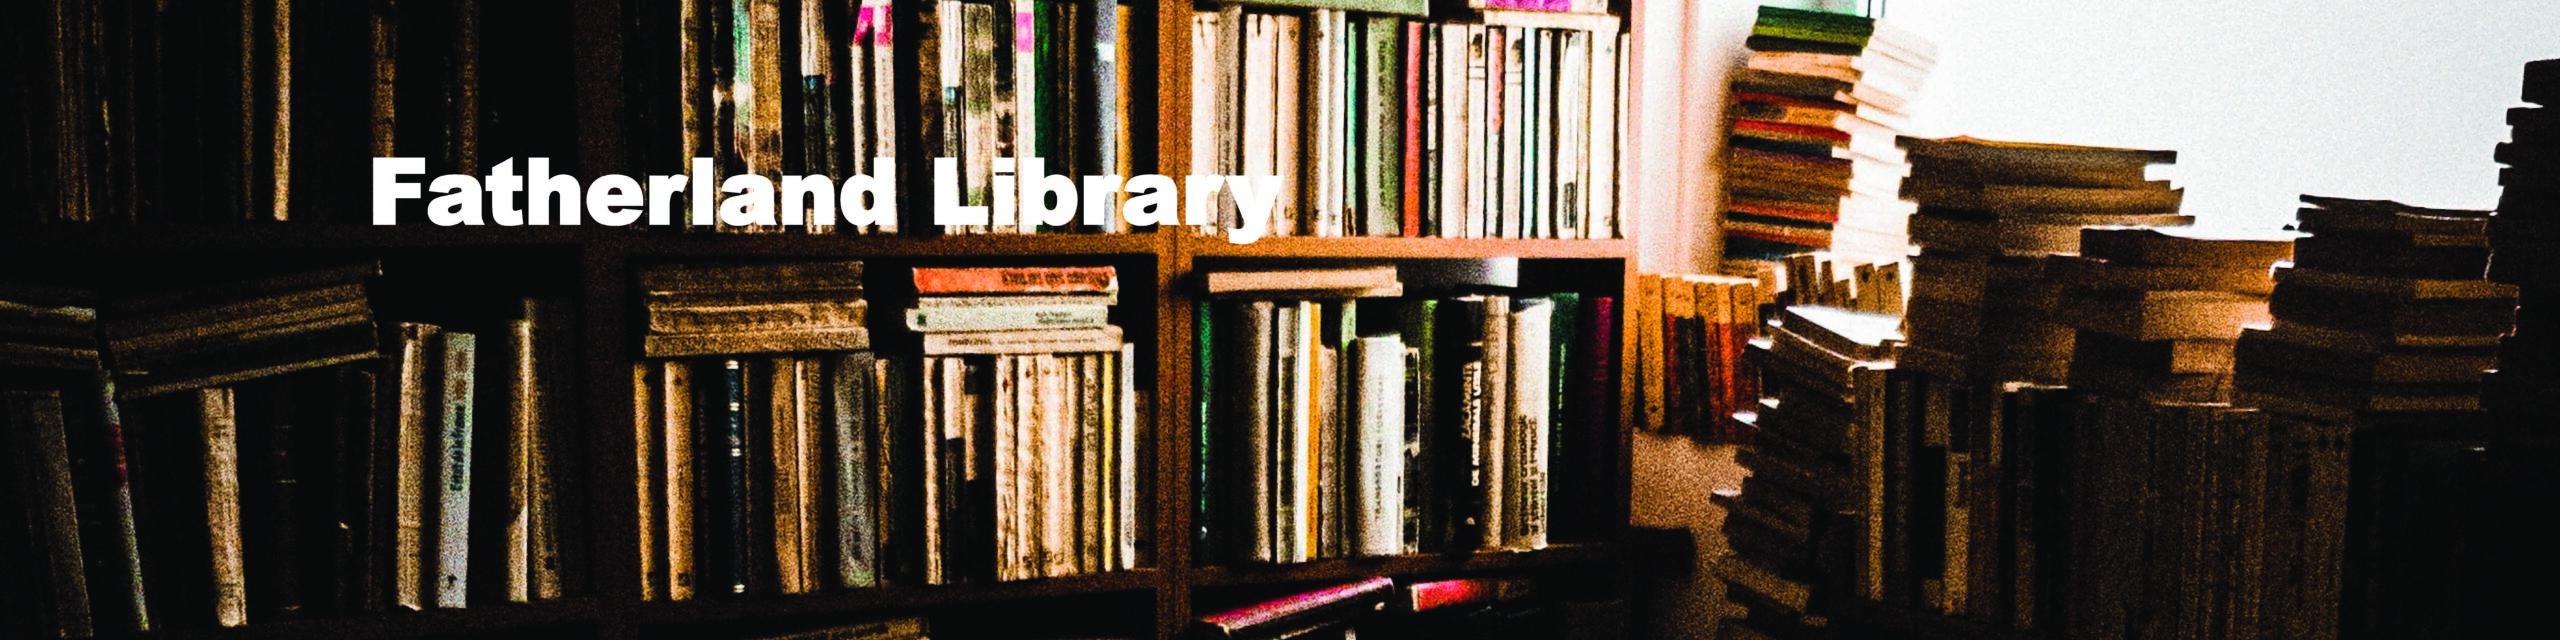 Fatherland Library-books01